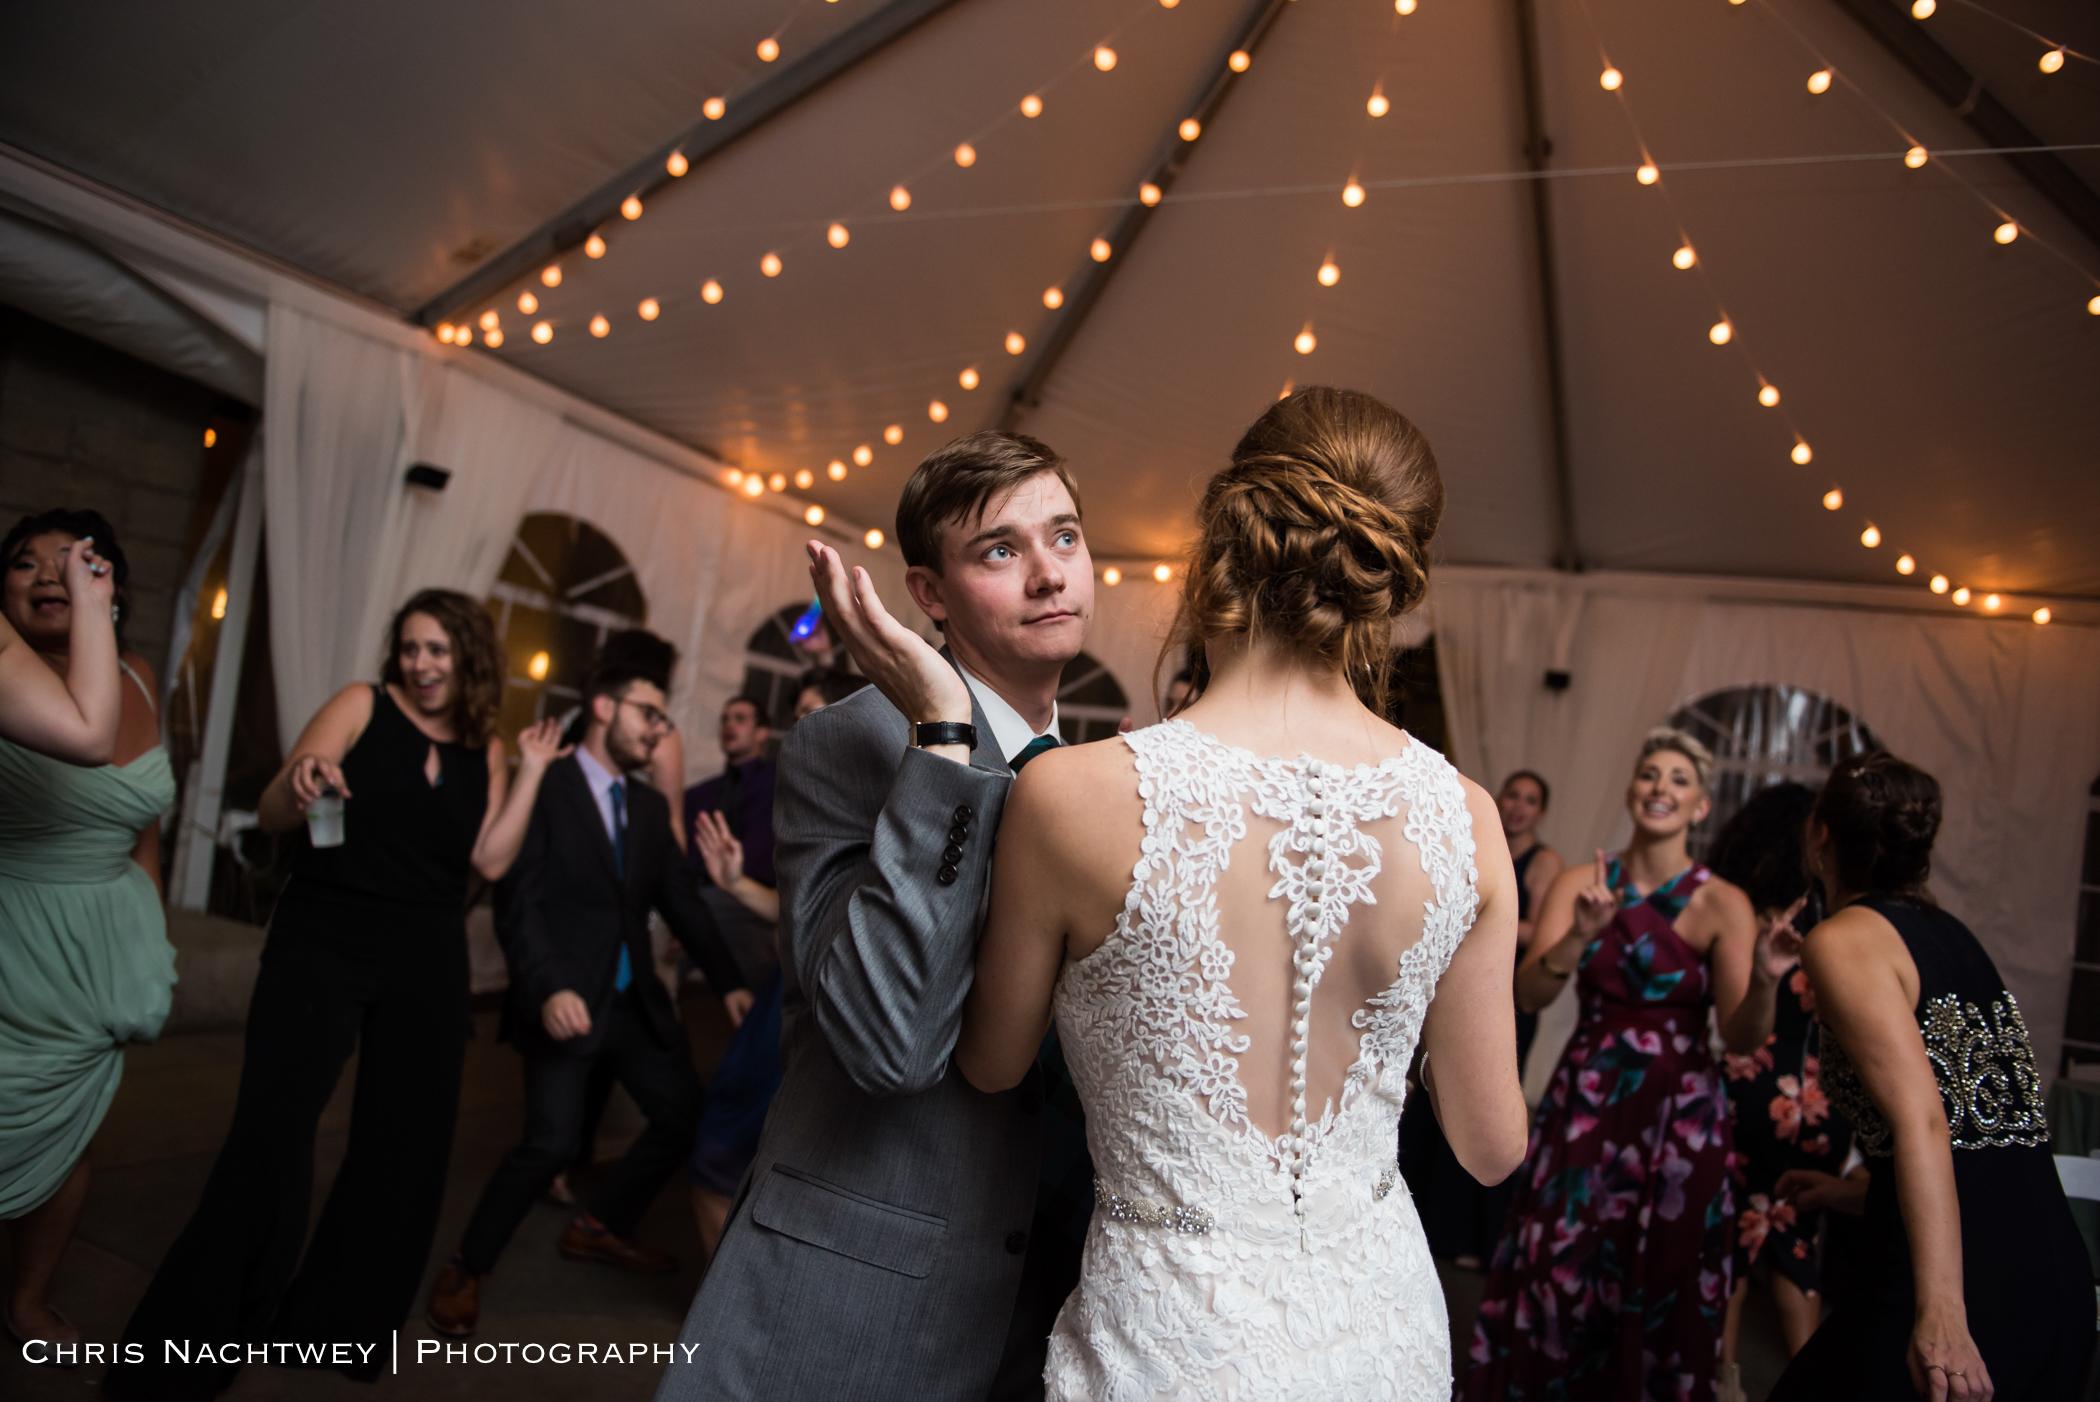 harkness-wedding-photos-chris-nachtwey-photography-2018-50.jpg